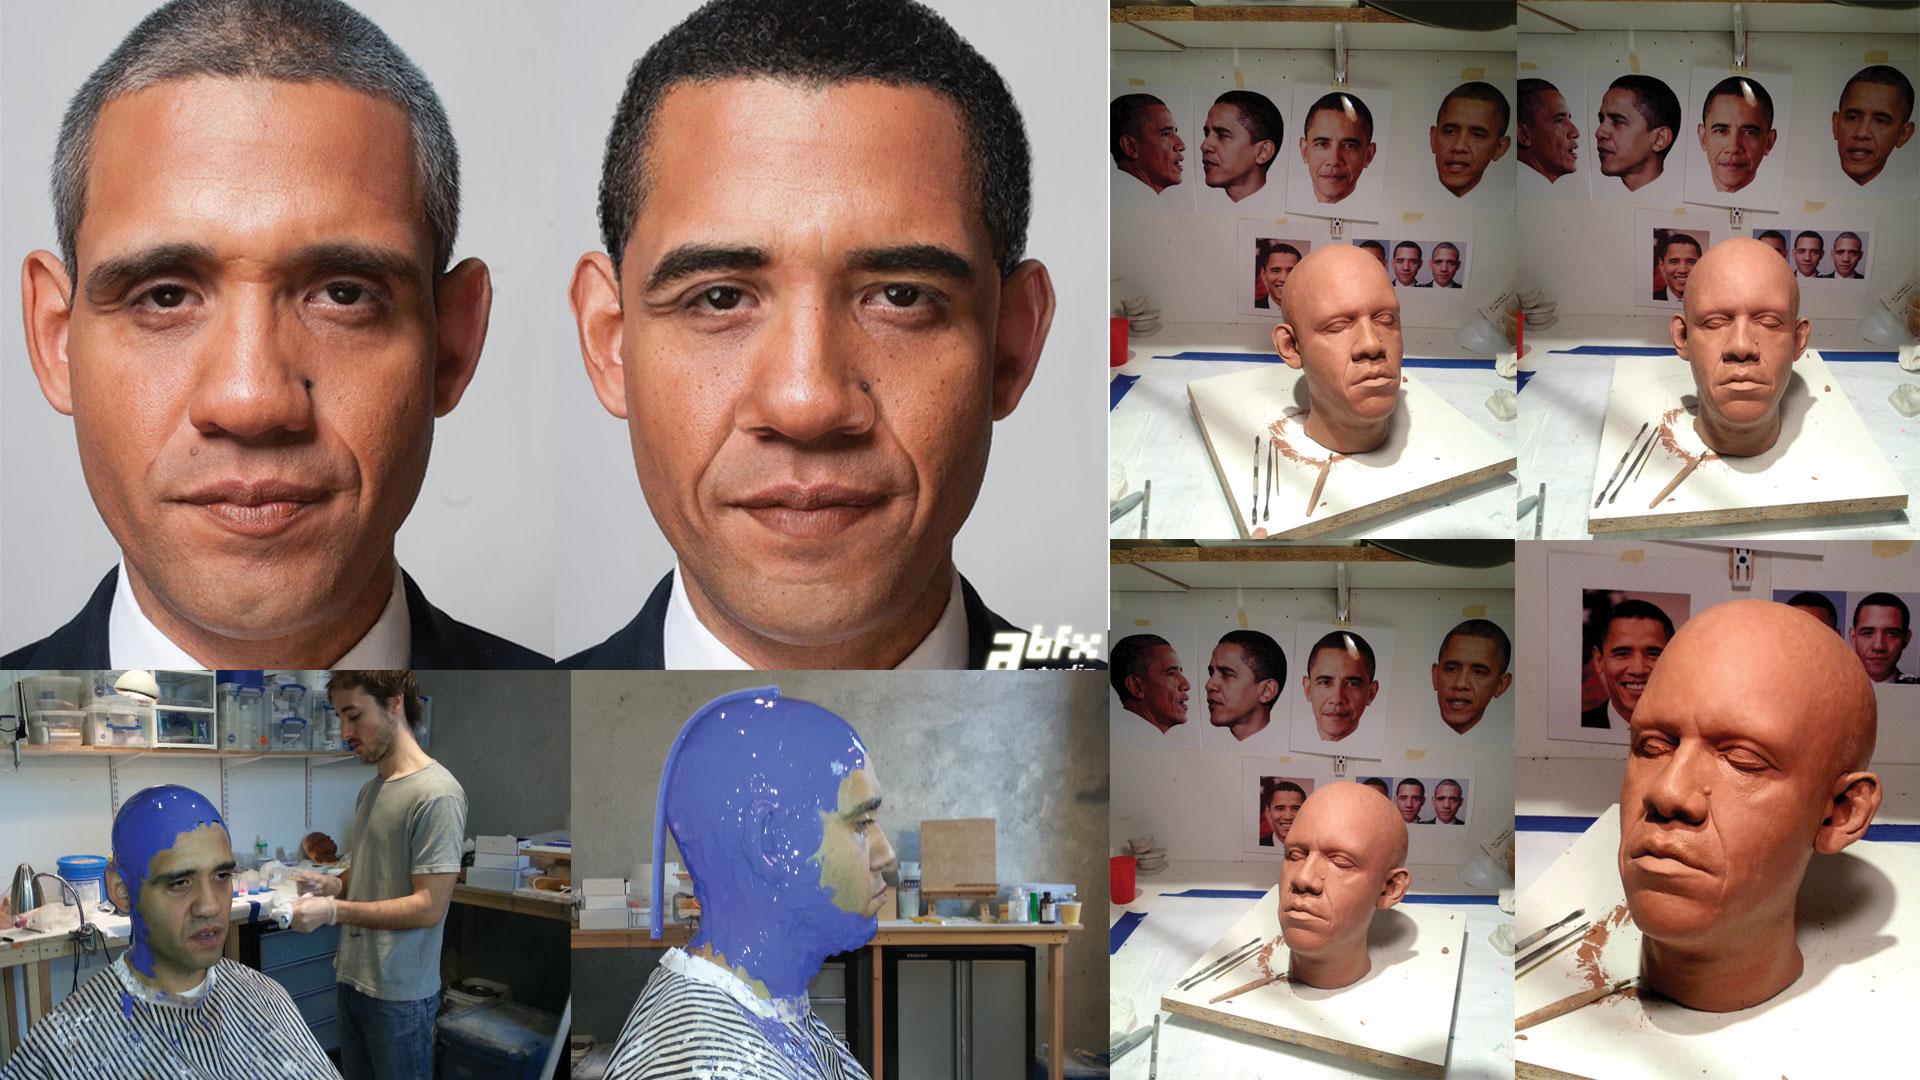 obama-impersonator-prosthetic-makeup